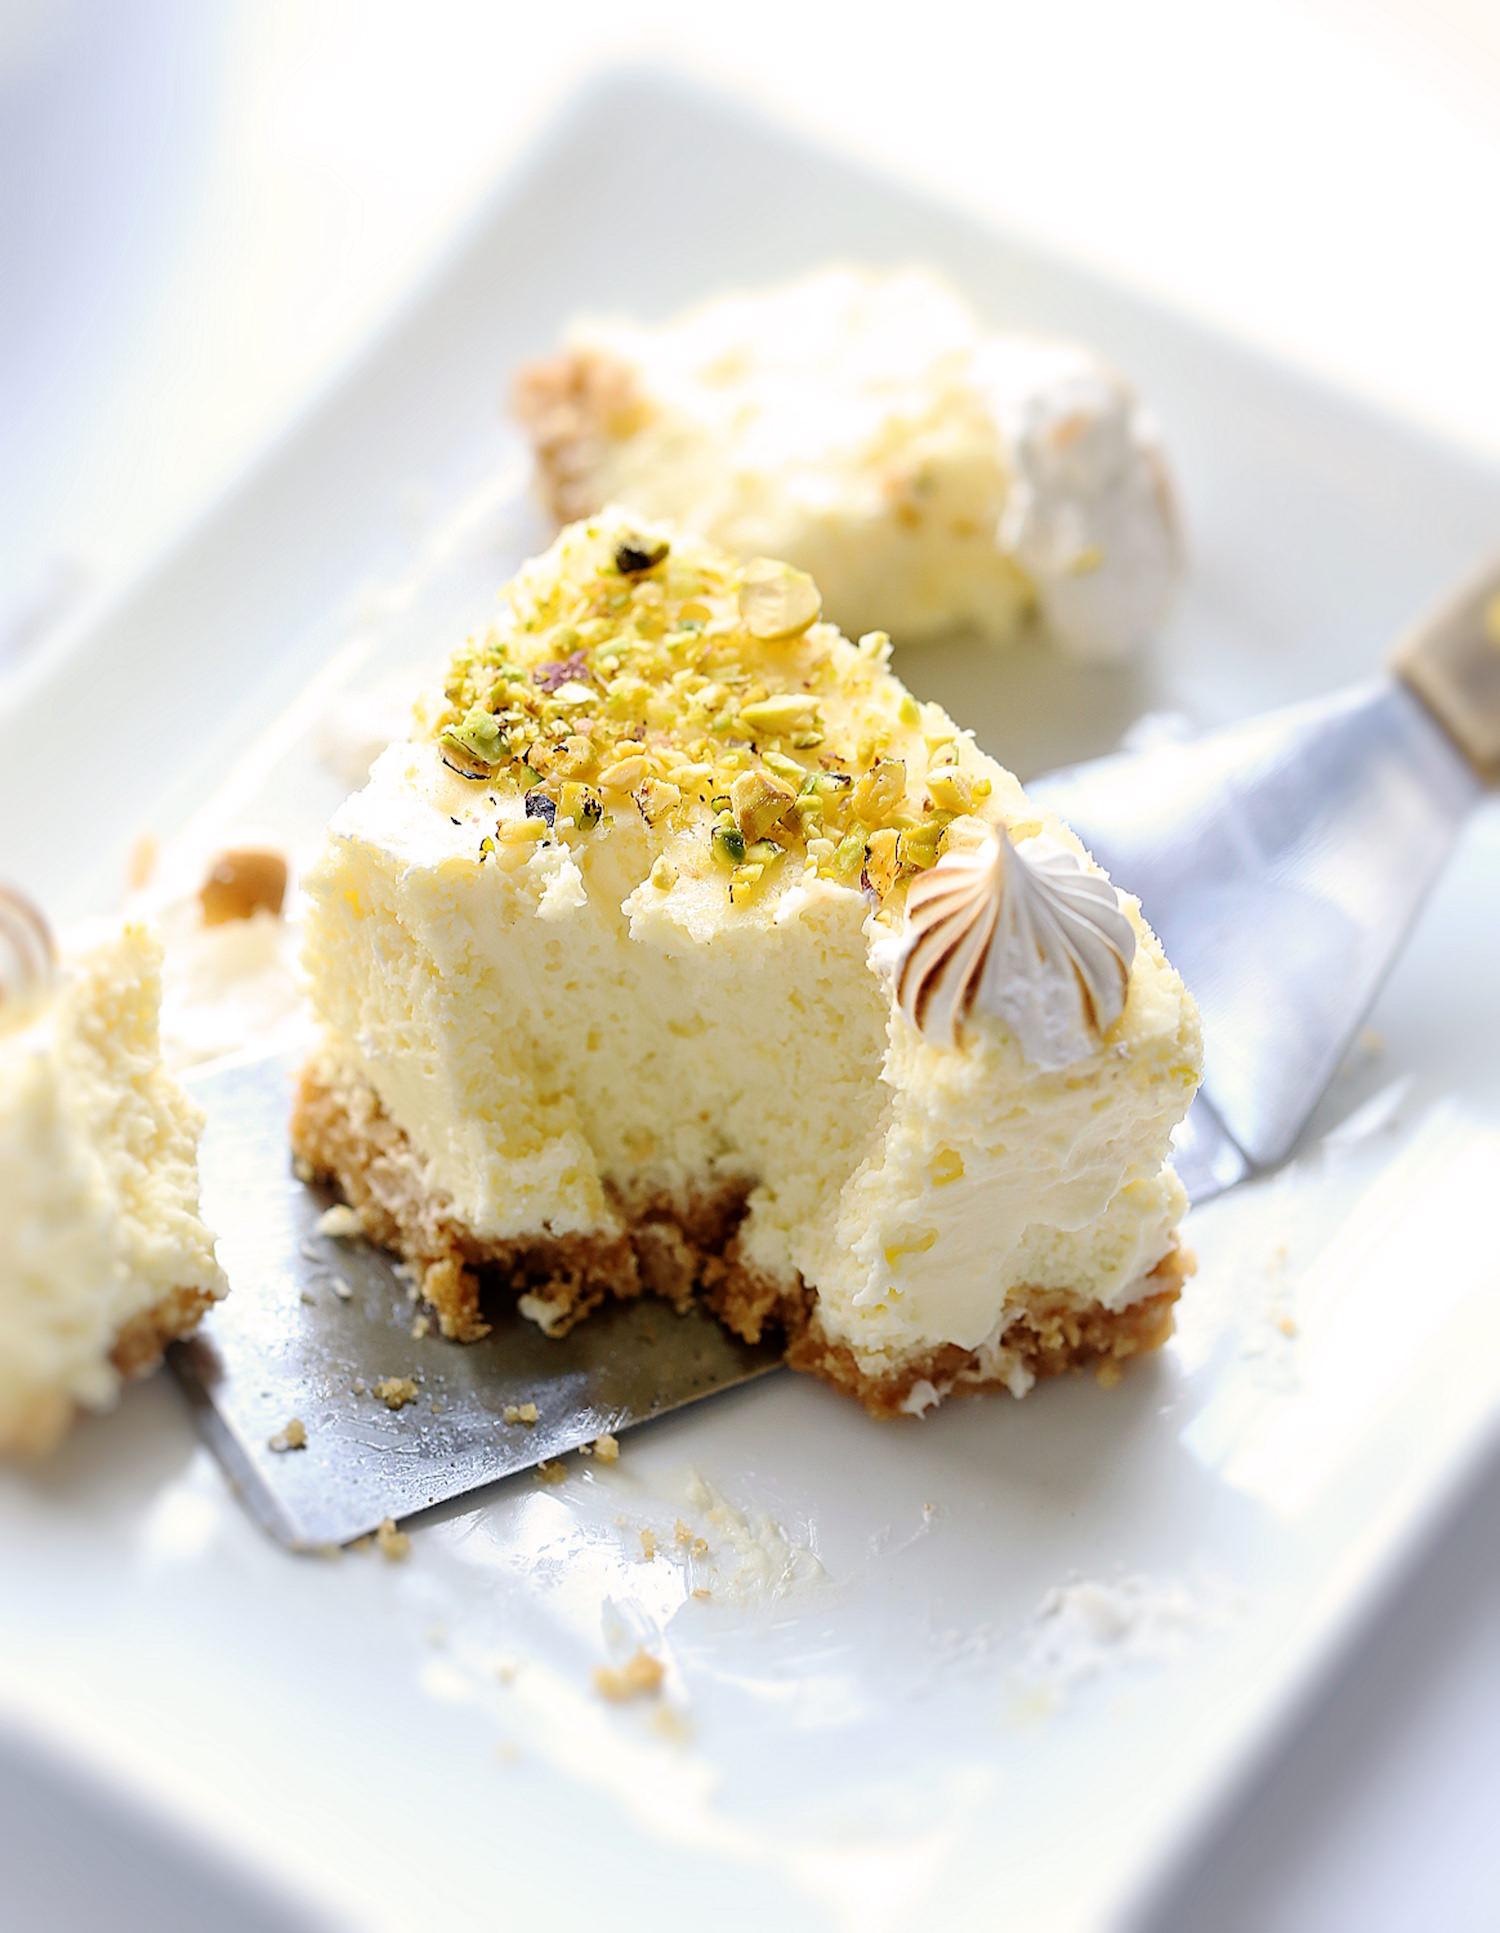 Creamy Lemon Meringue Cheesecake: buttery cookie crust, creamy, tart, spiked lemon filling, and sweet meringue topping. SO good! | TrufflesandTrends.com